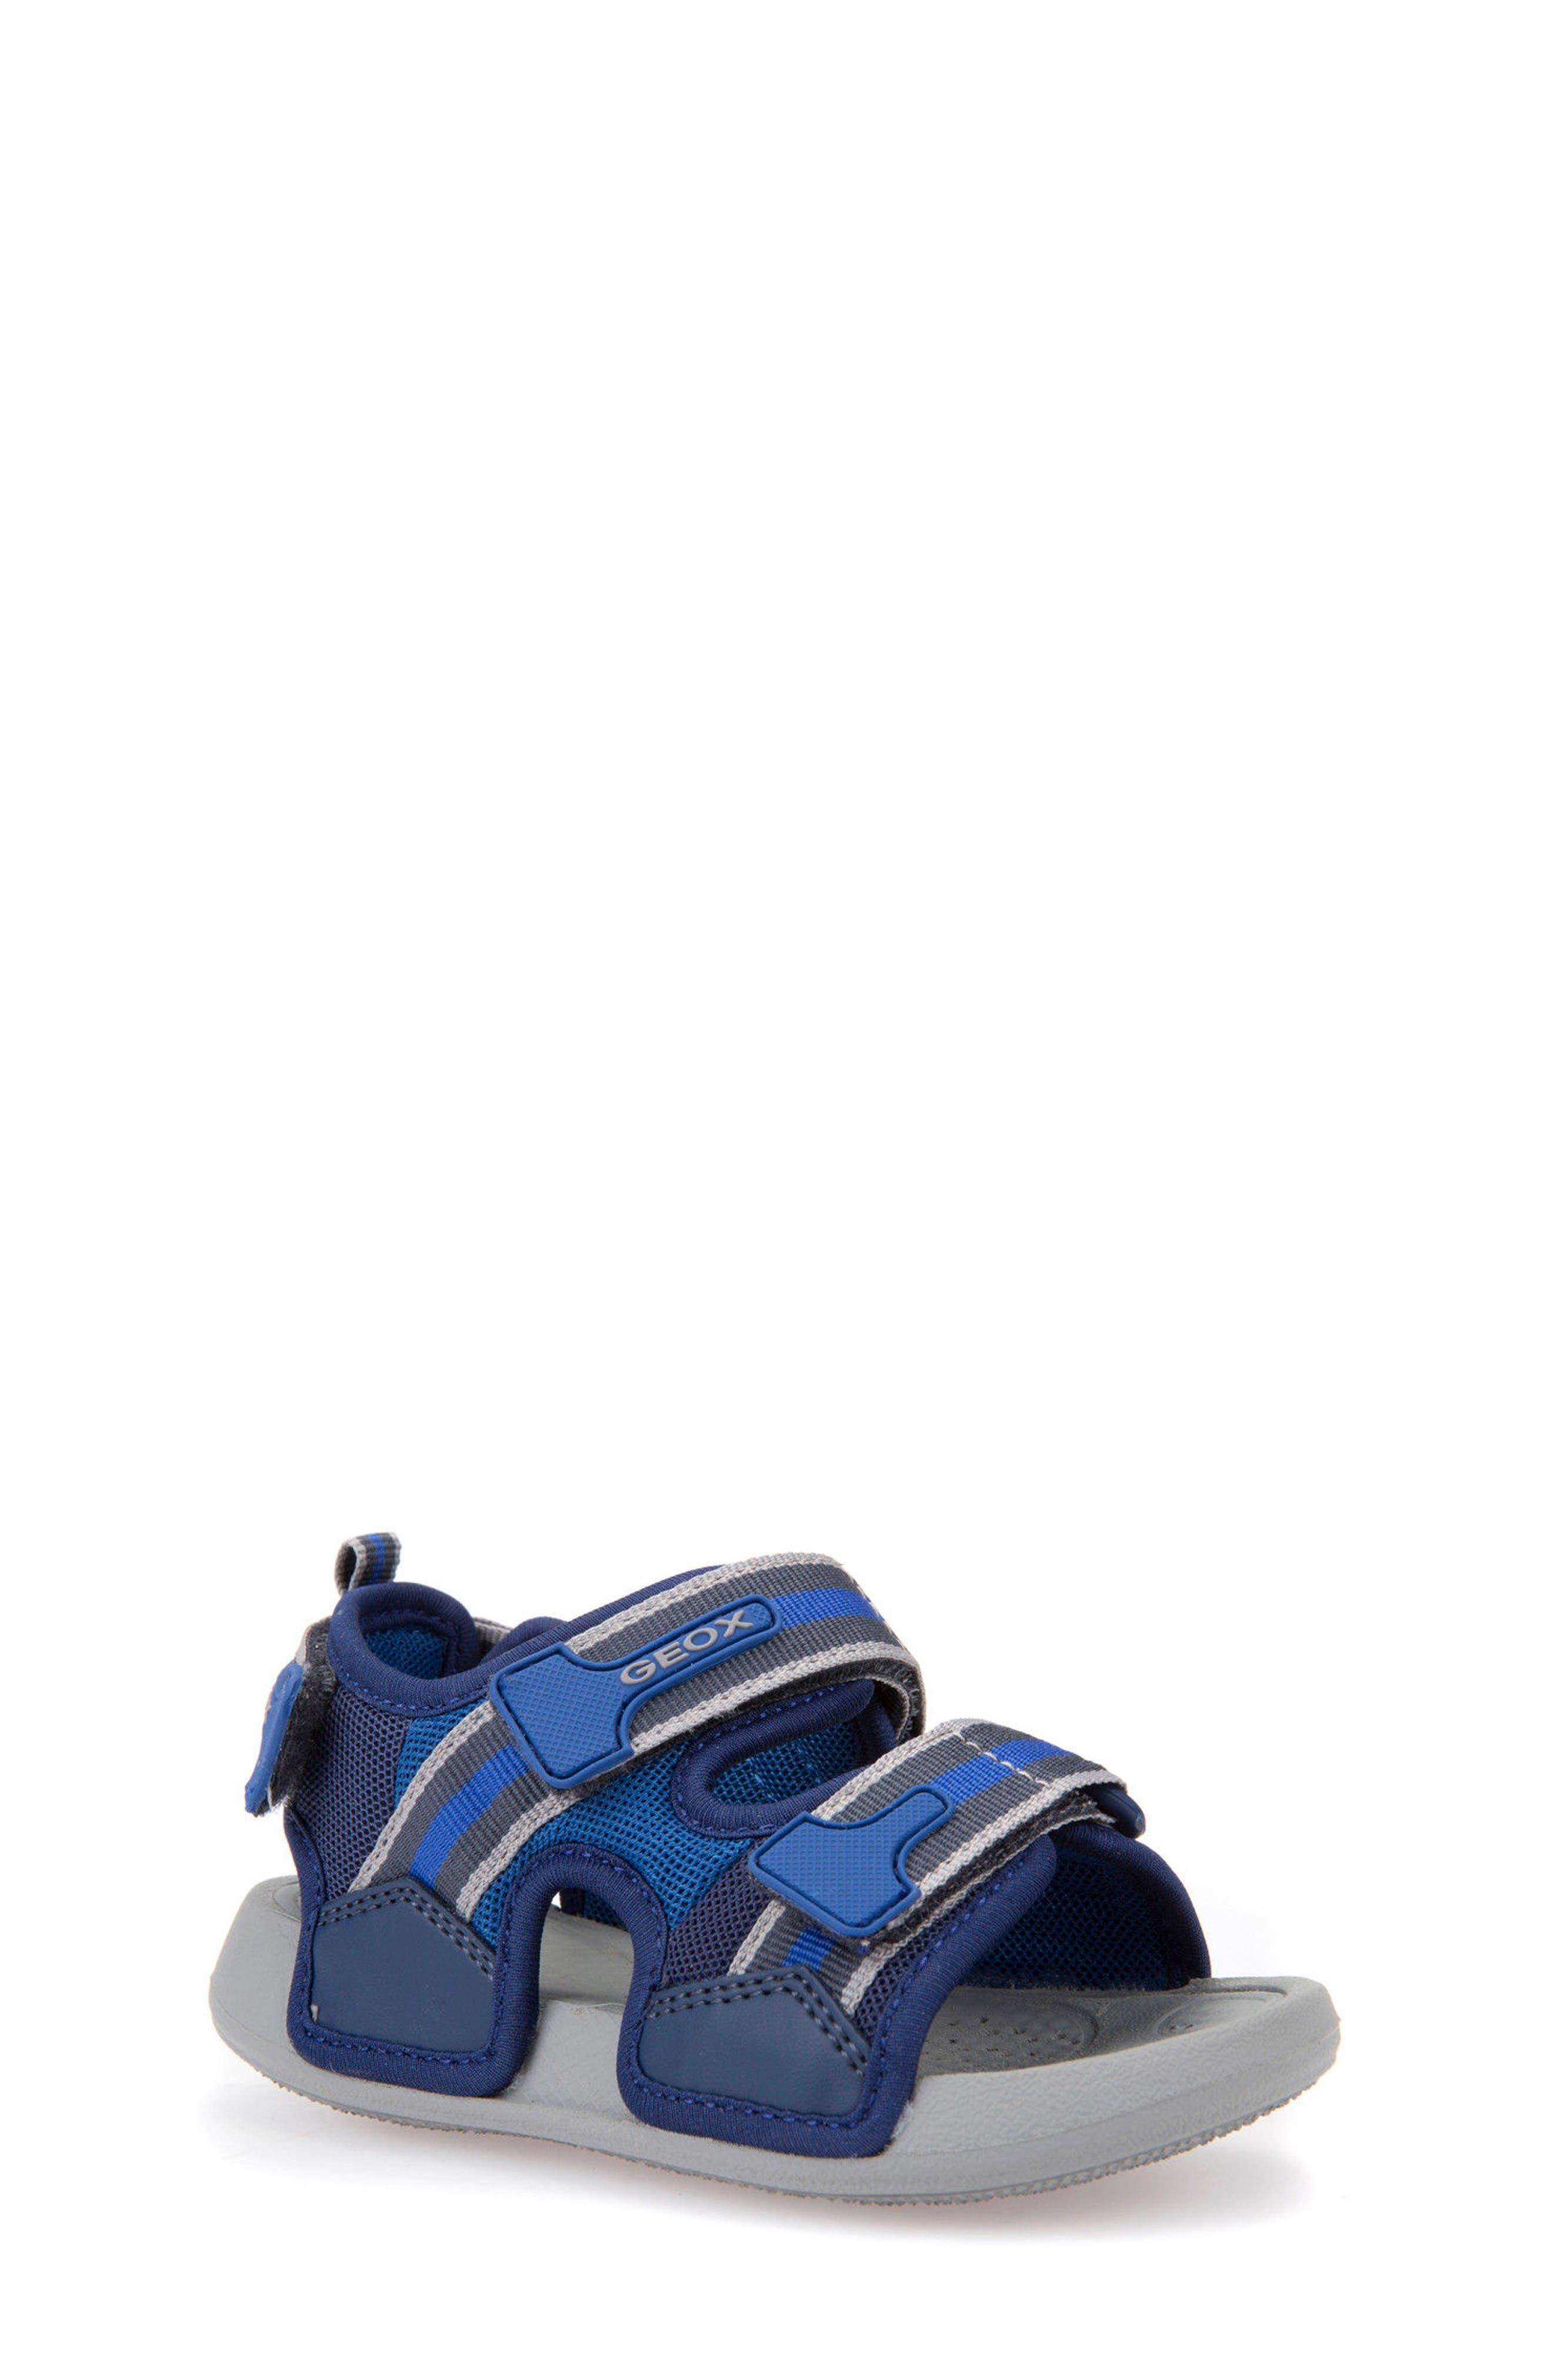 Ultrak Sandal,                         Main,                         color, NAVY/ ROYAL